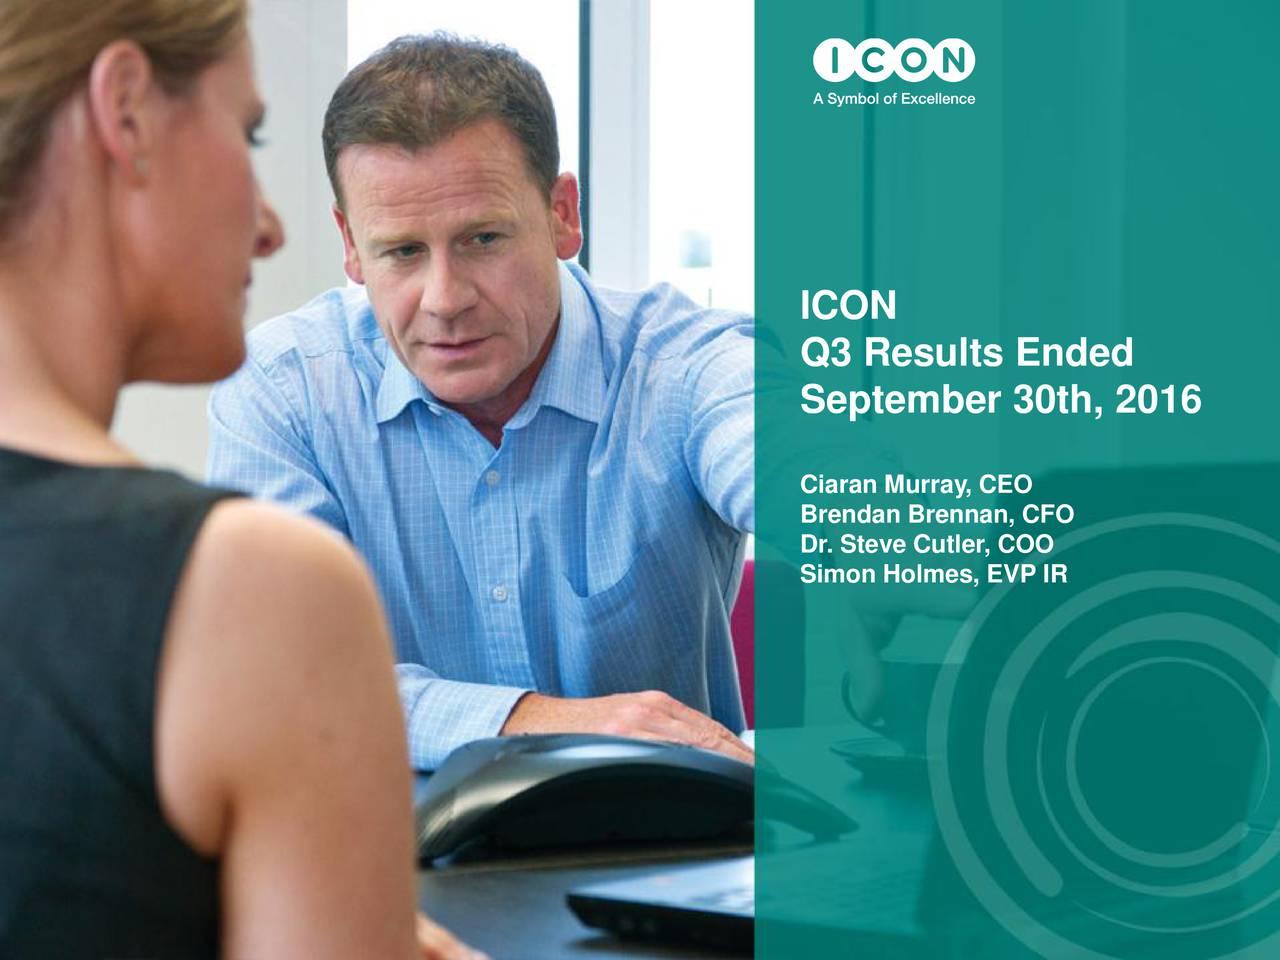 Q3 Results Ended September 30th, 2016 Ciaran Murray, CEO Brendan Brennan, CFO Dr. Steve Cutler, COO Simon Holmes, EVP IR